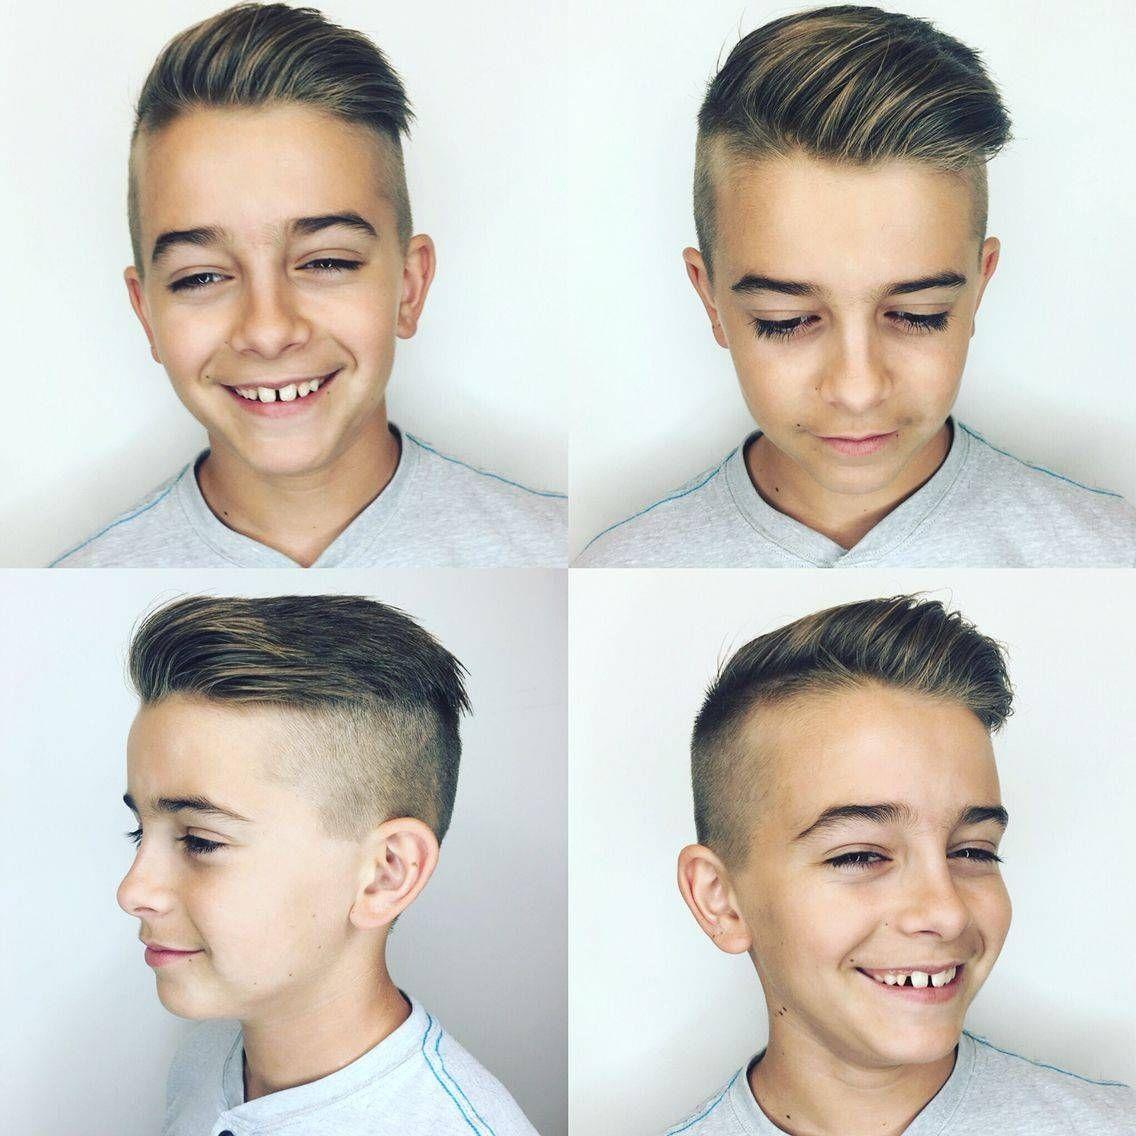 Top Kid Undercut Hairstyle New Style In 2019 Hair Cuts Hair